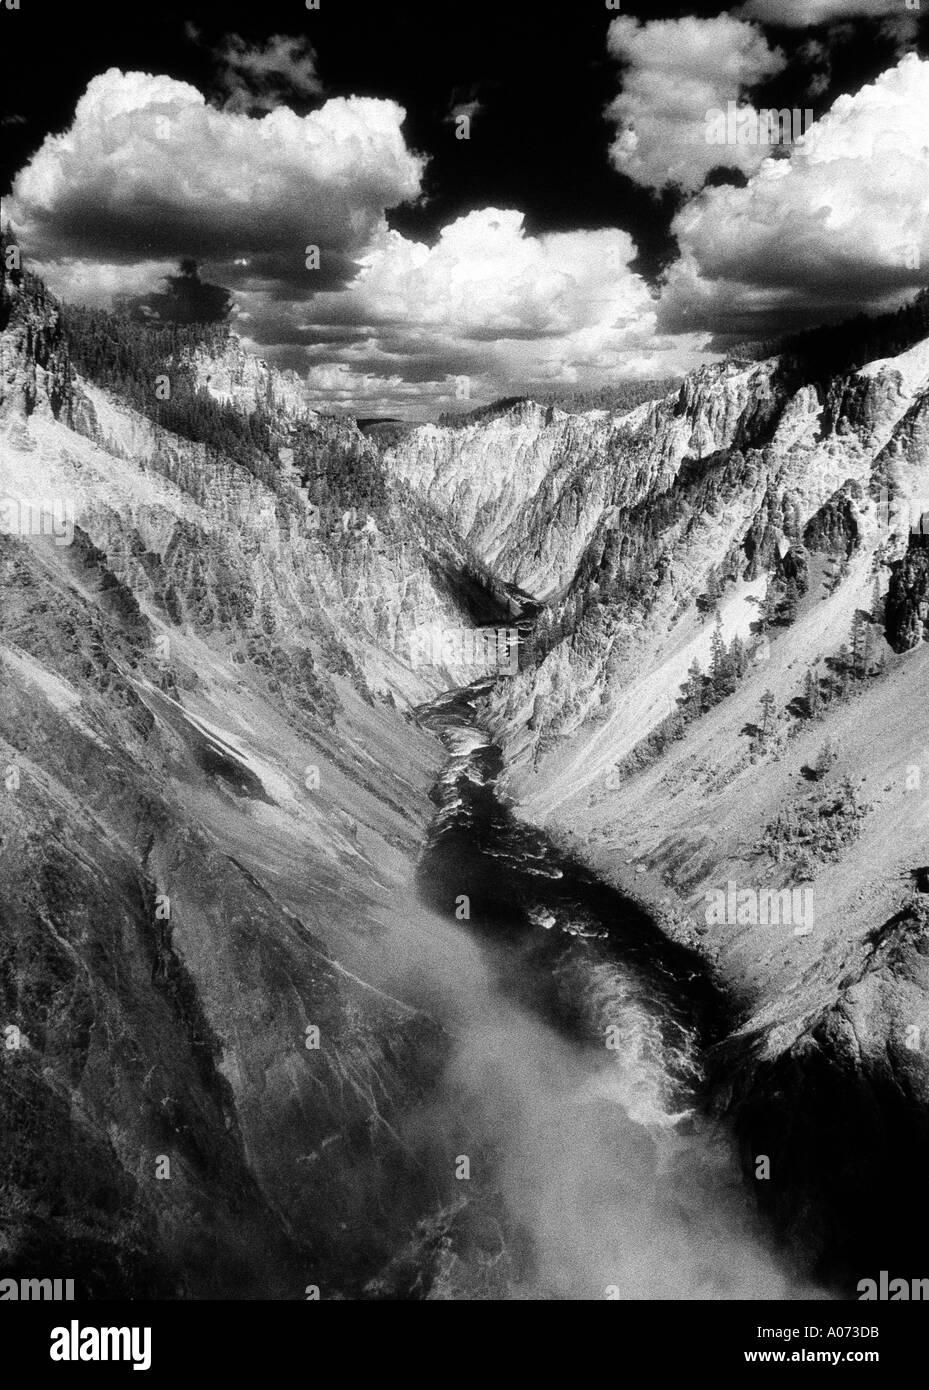 The Grand Canyon of Yellowstone River Yellowstone Natl Park Wyoming USA - Stock Image